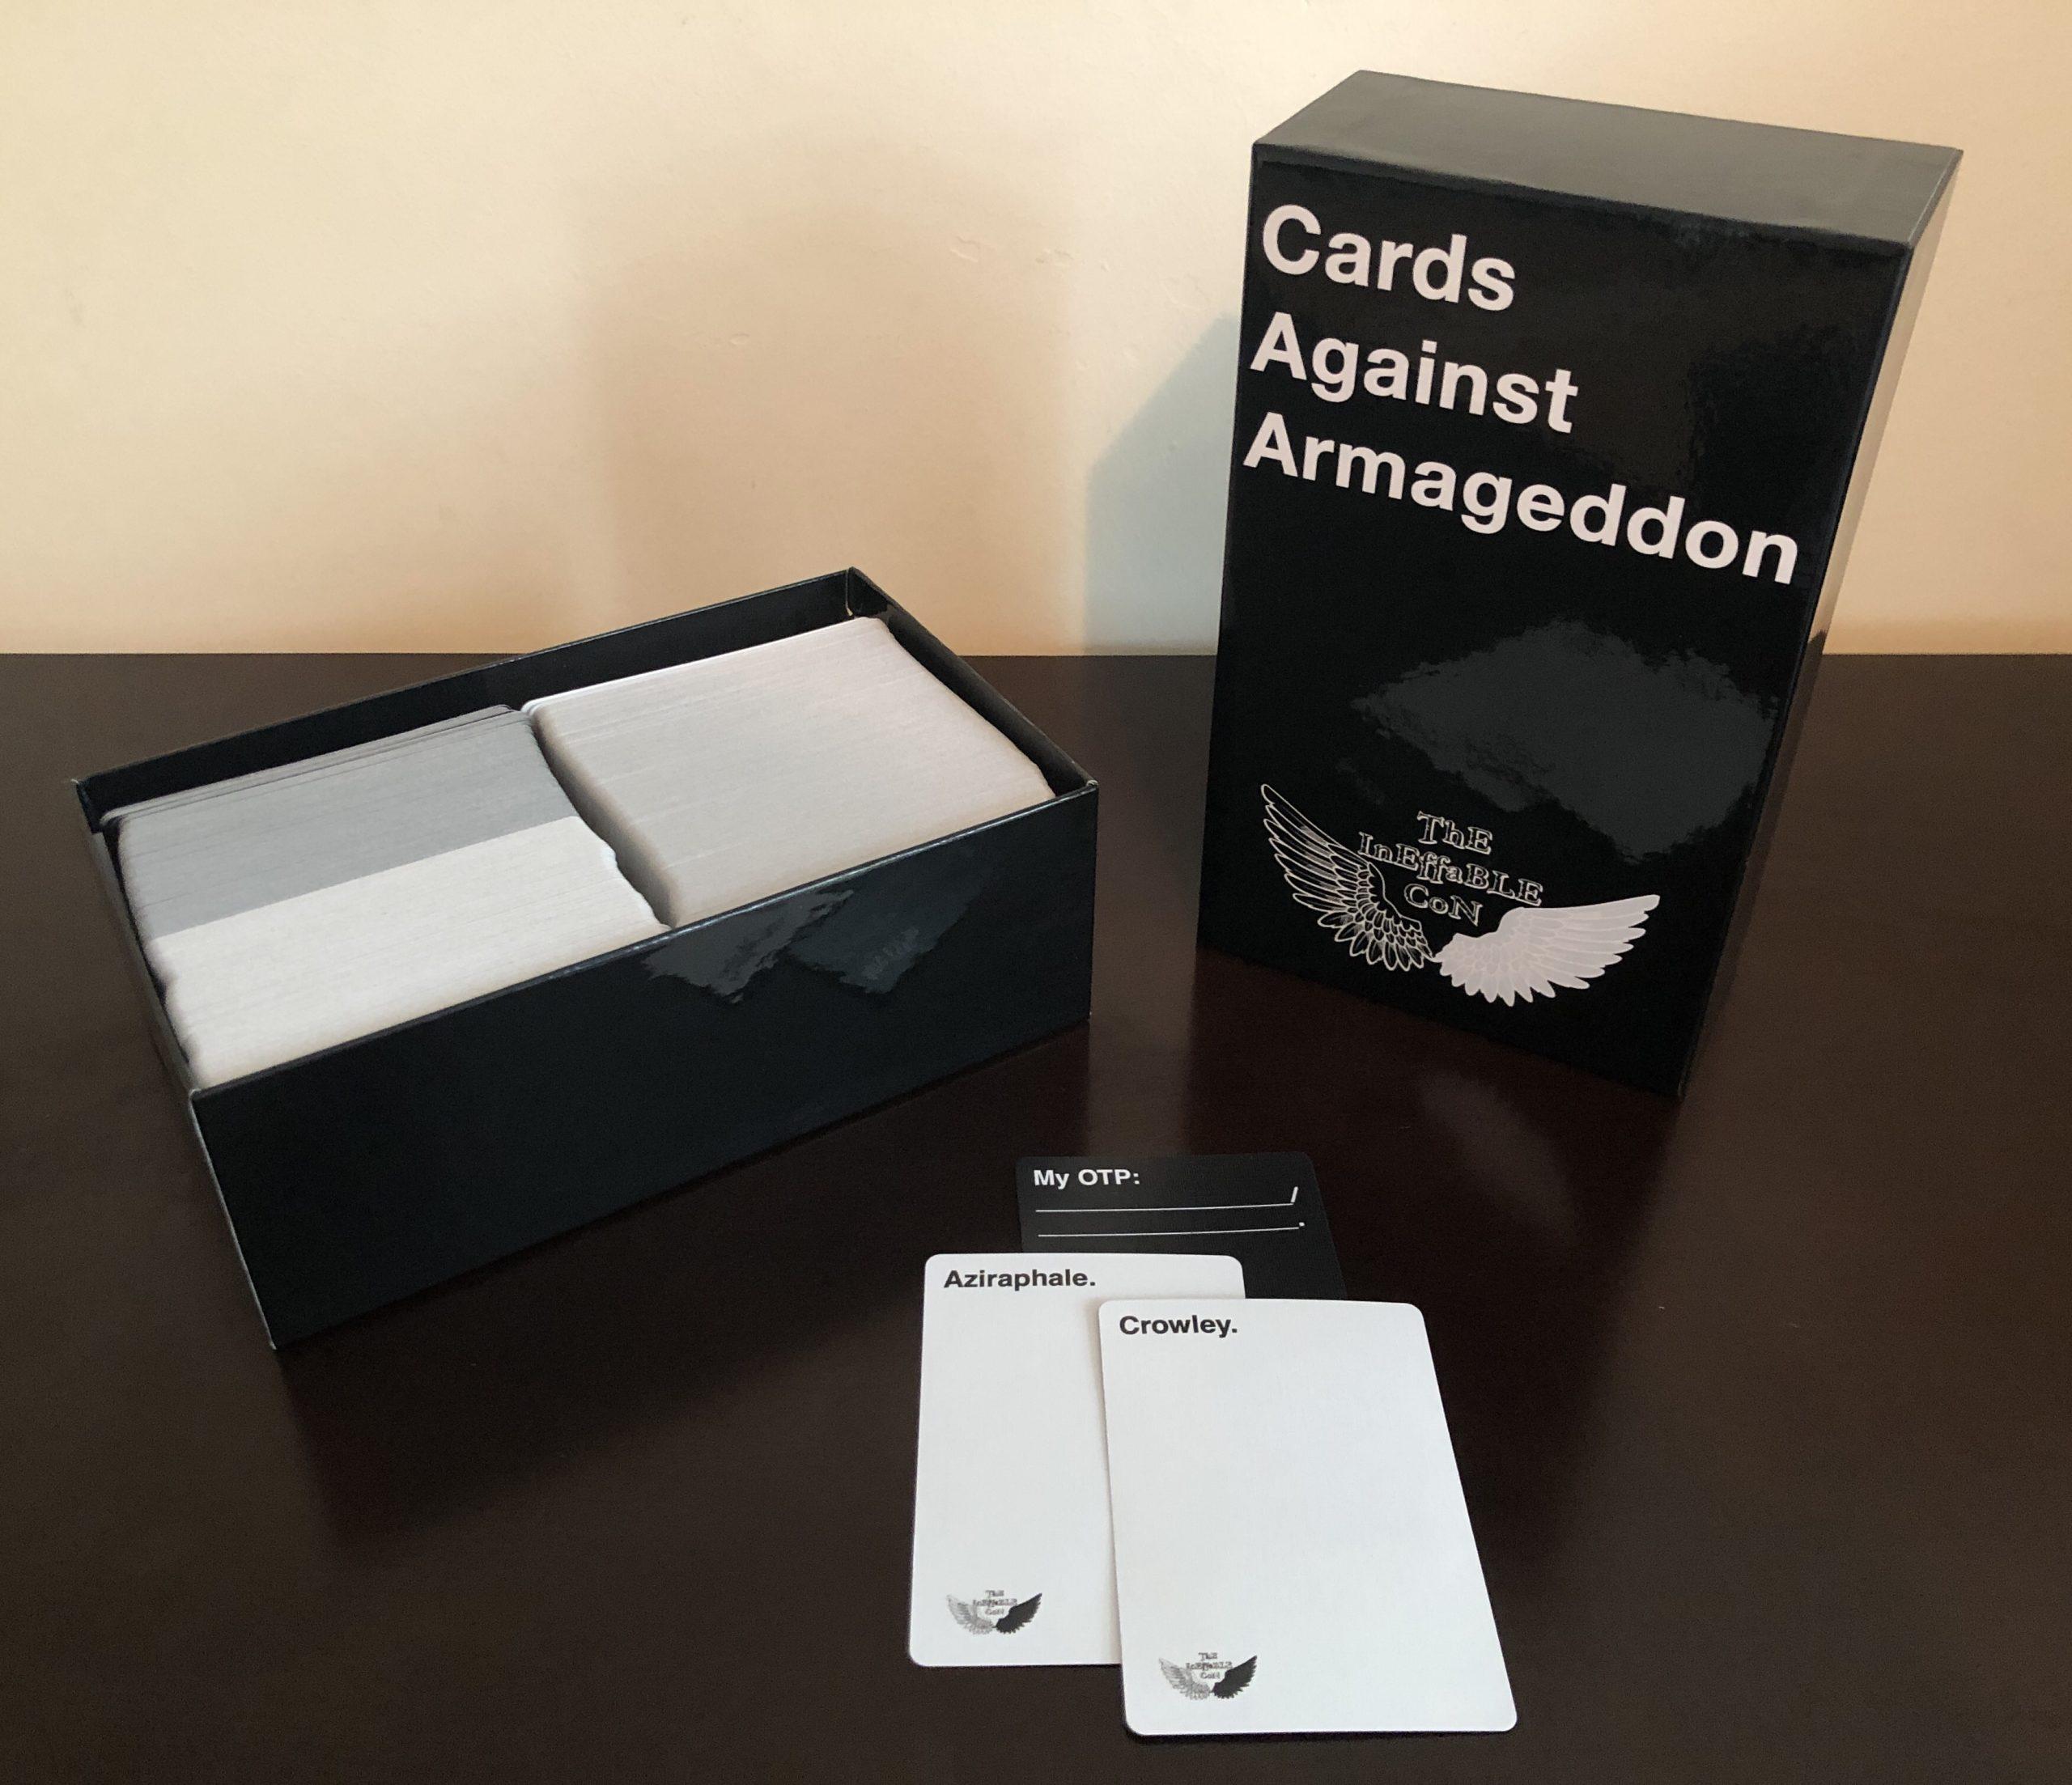 Cards Against Armageddon